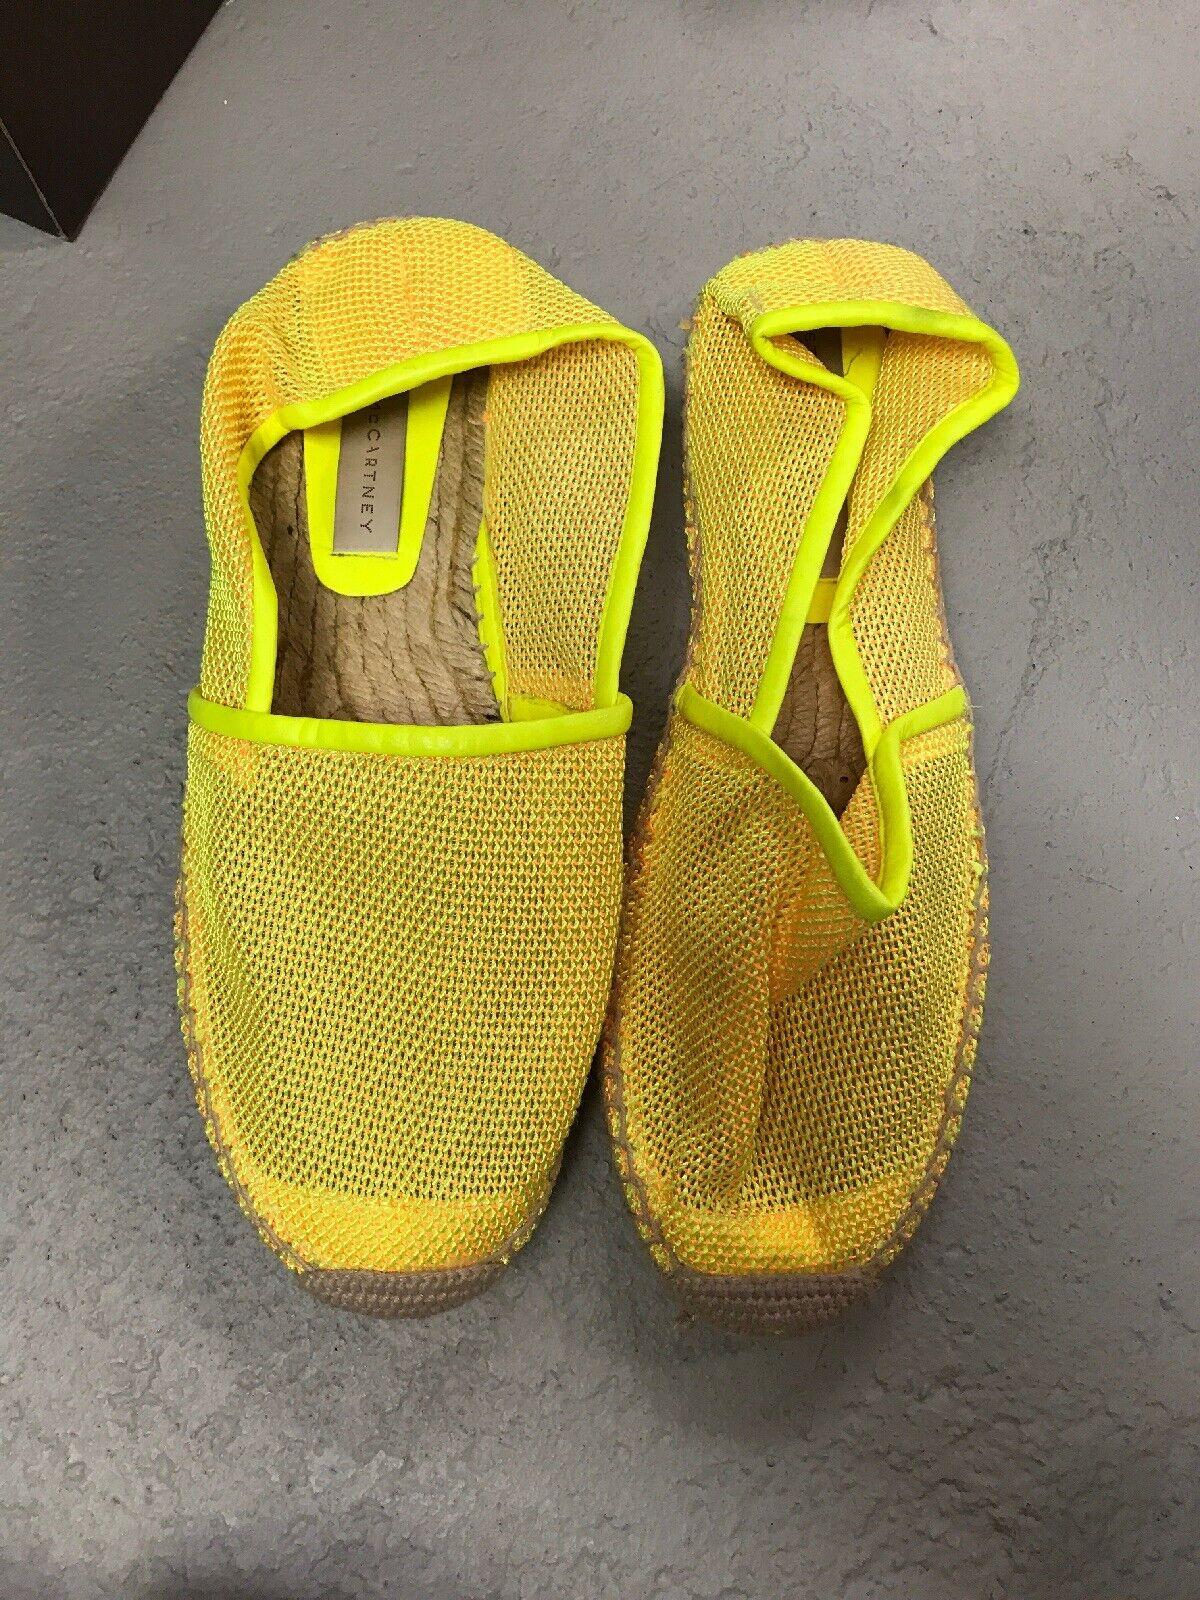 Stella mccartney shoes Espadrilles Size 41 Yellow Neon